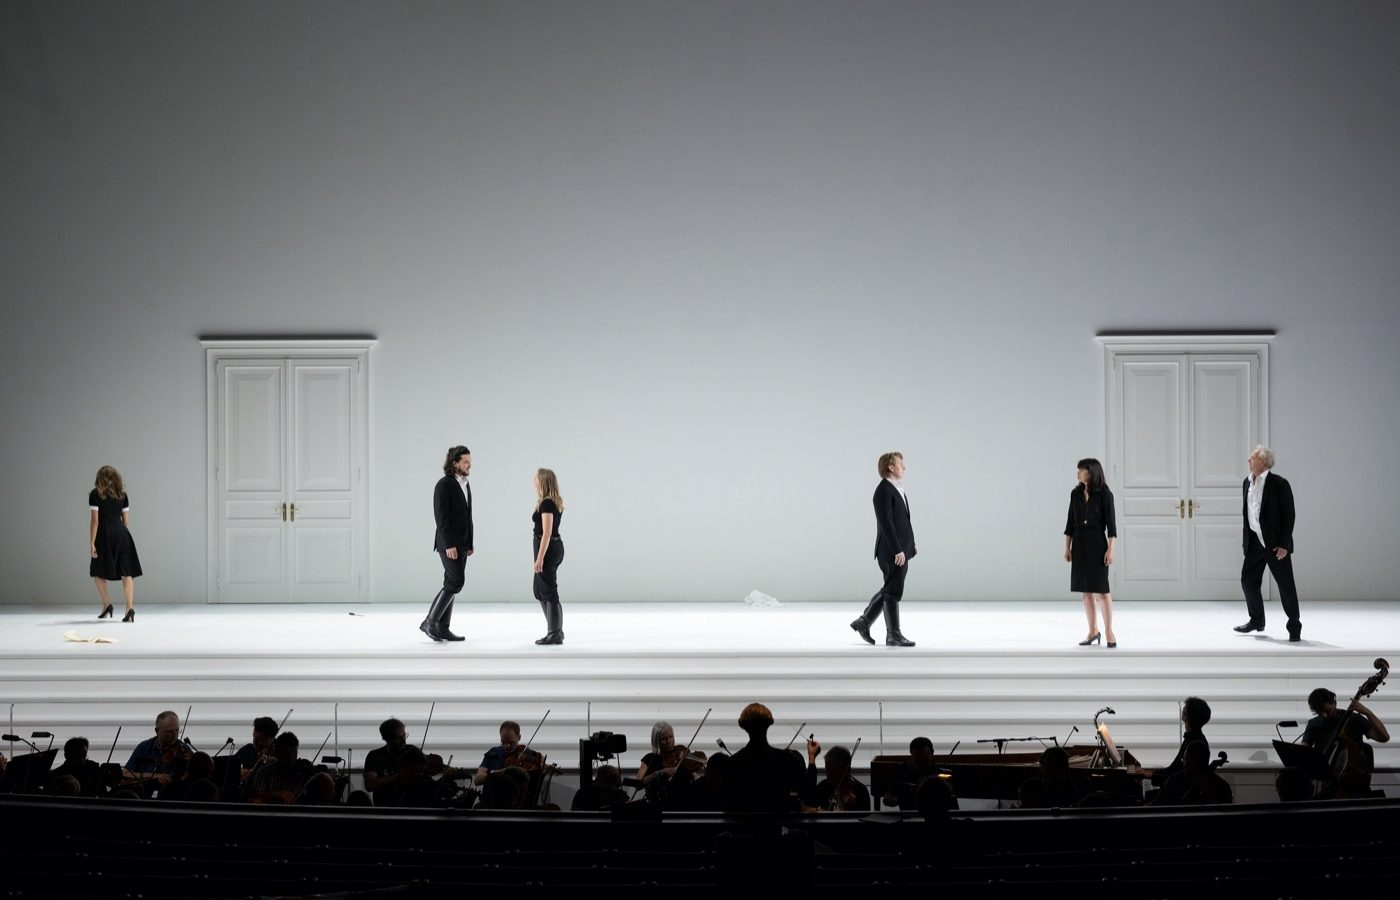 Leiacker-Loy-Cosi-Fan-Tutte-Monika-Rittershaus-Salzburger-Festspiele-2020-00117